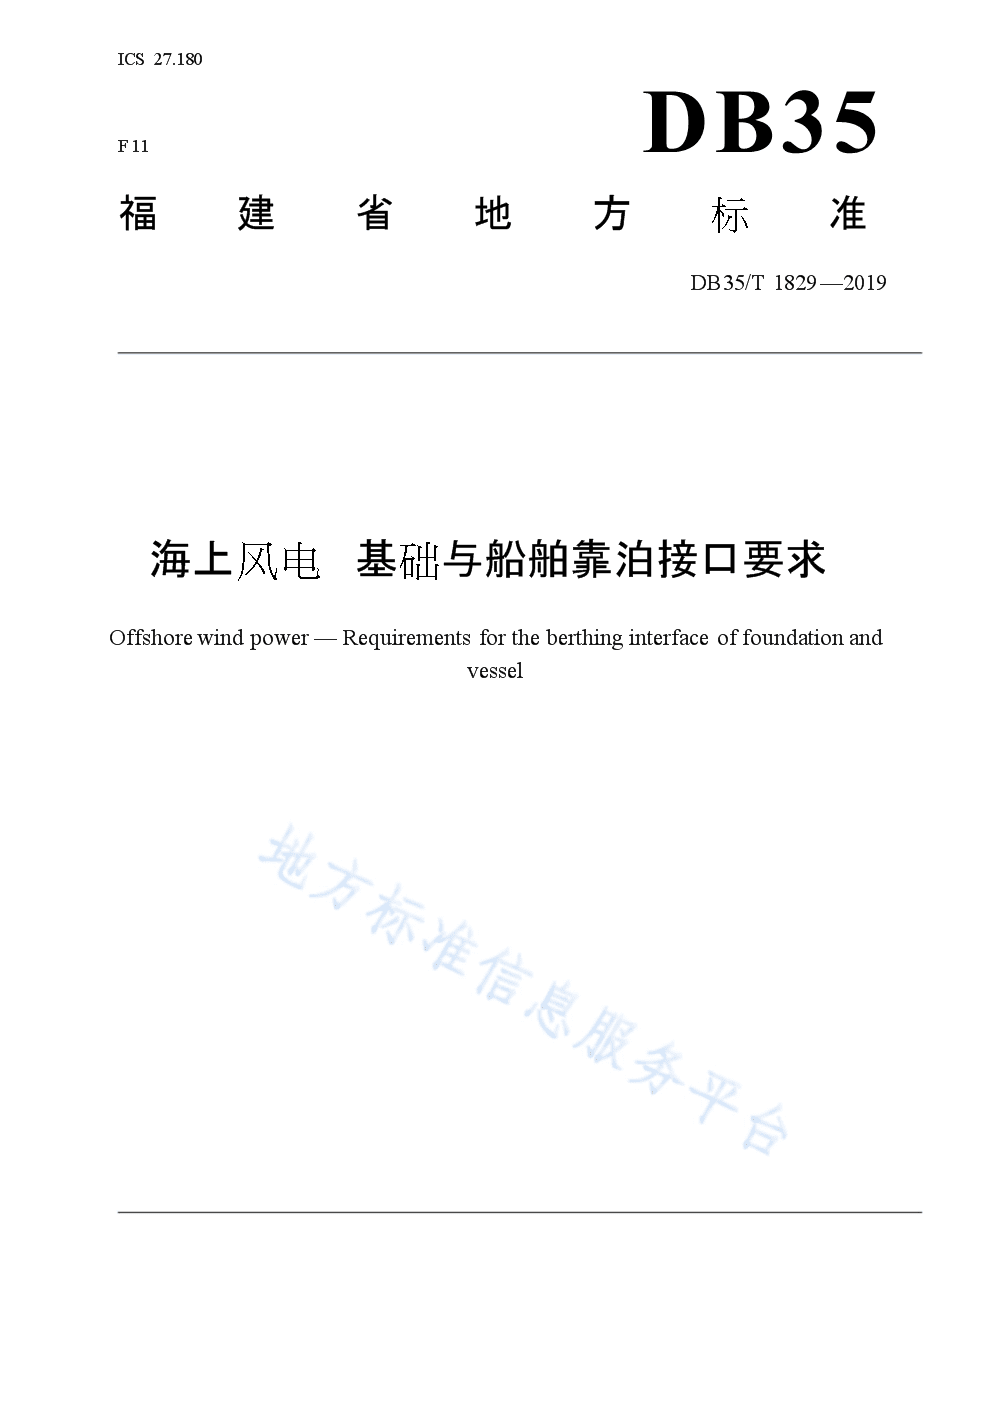 DB35_T 1829-2019海上风电  基础与船舶靠泊接口要求.docx